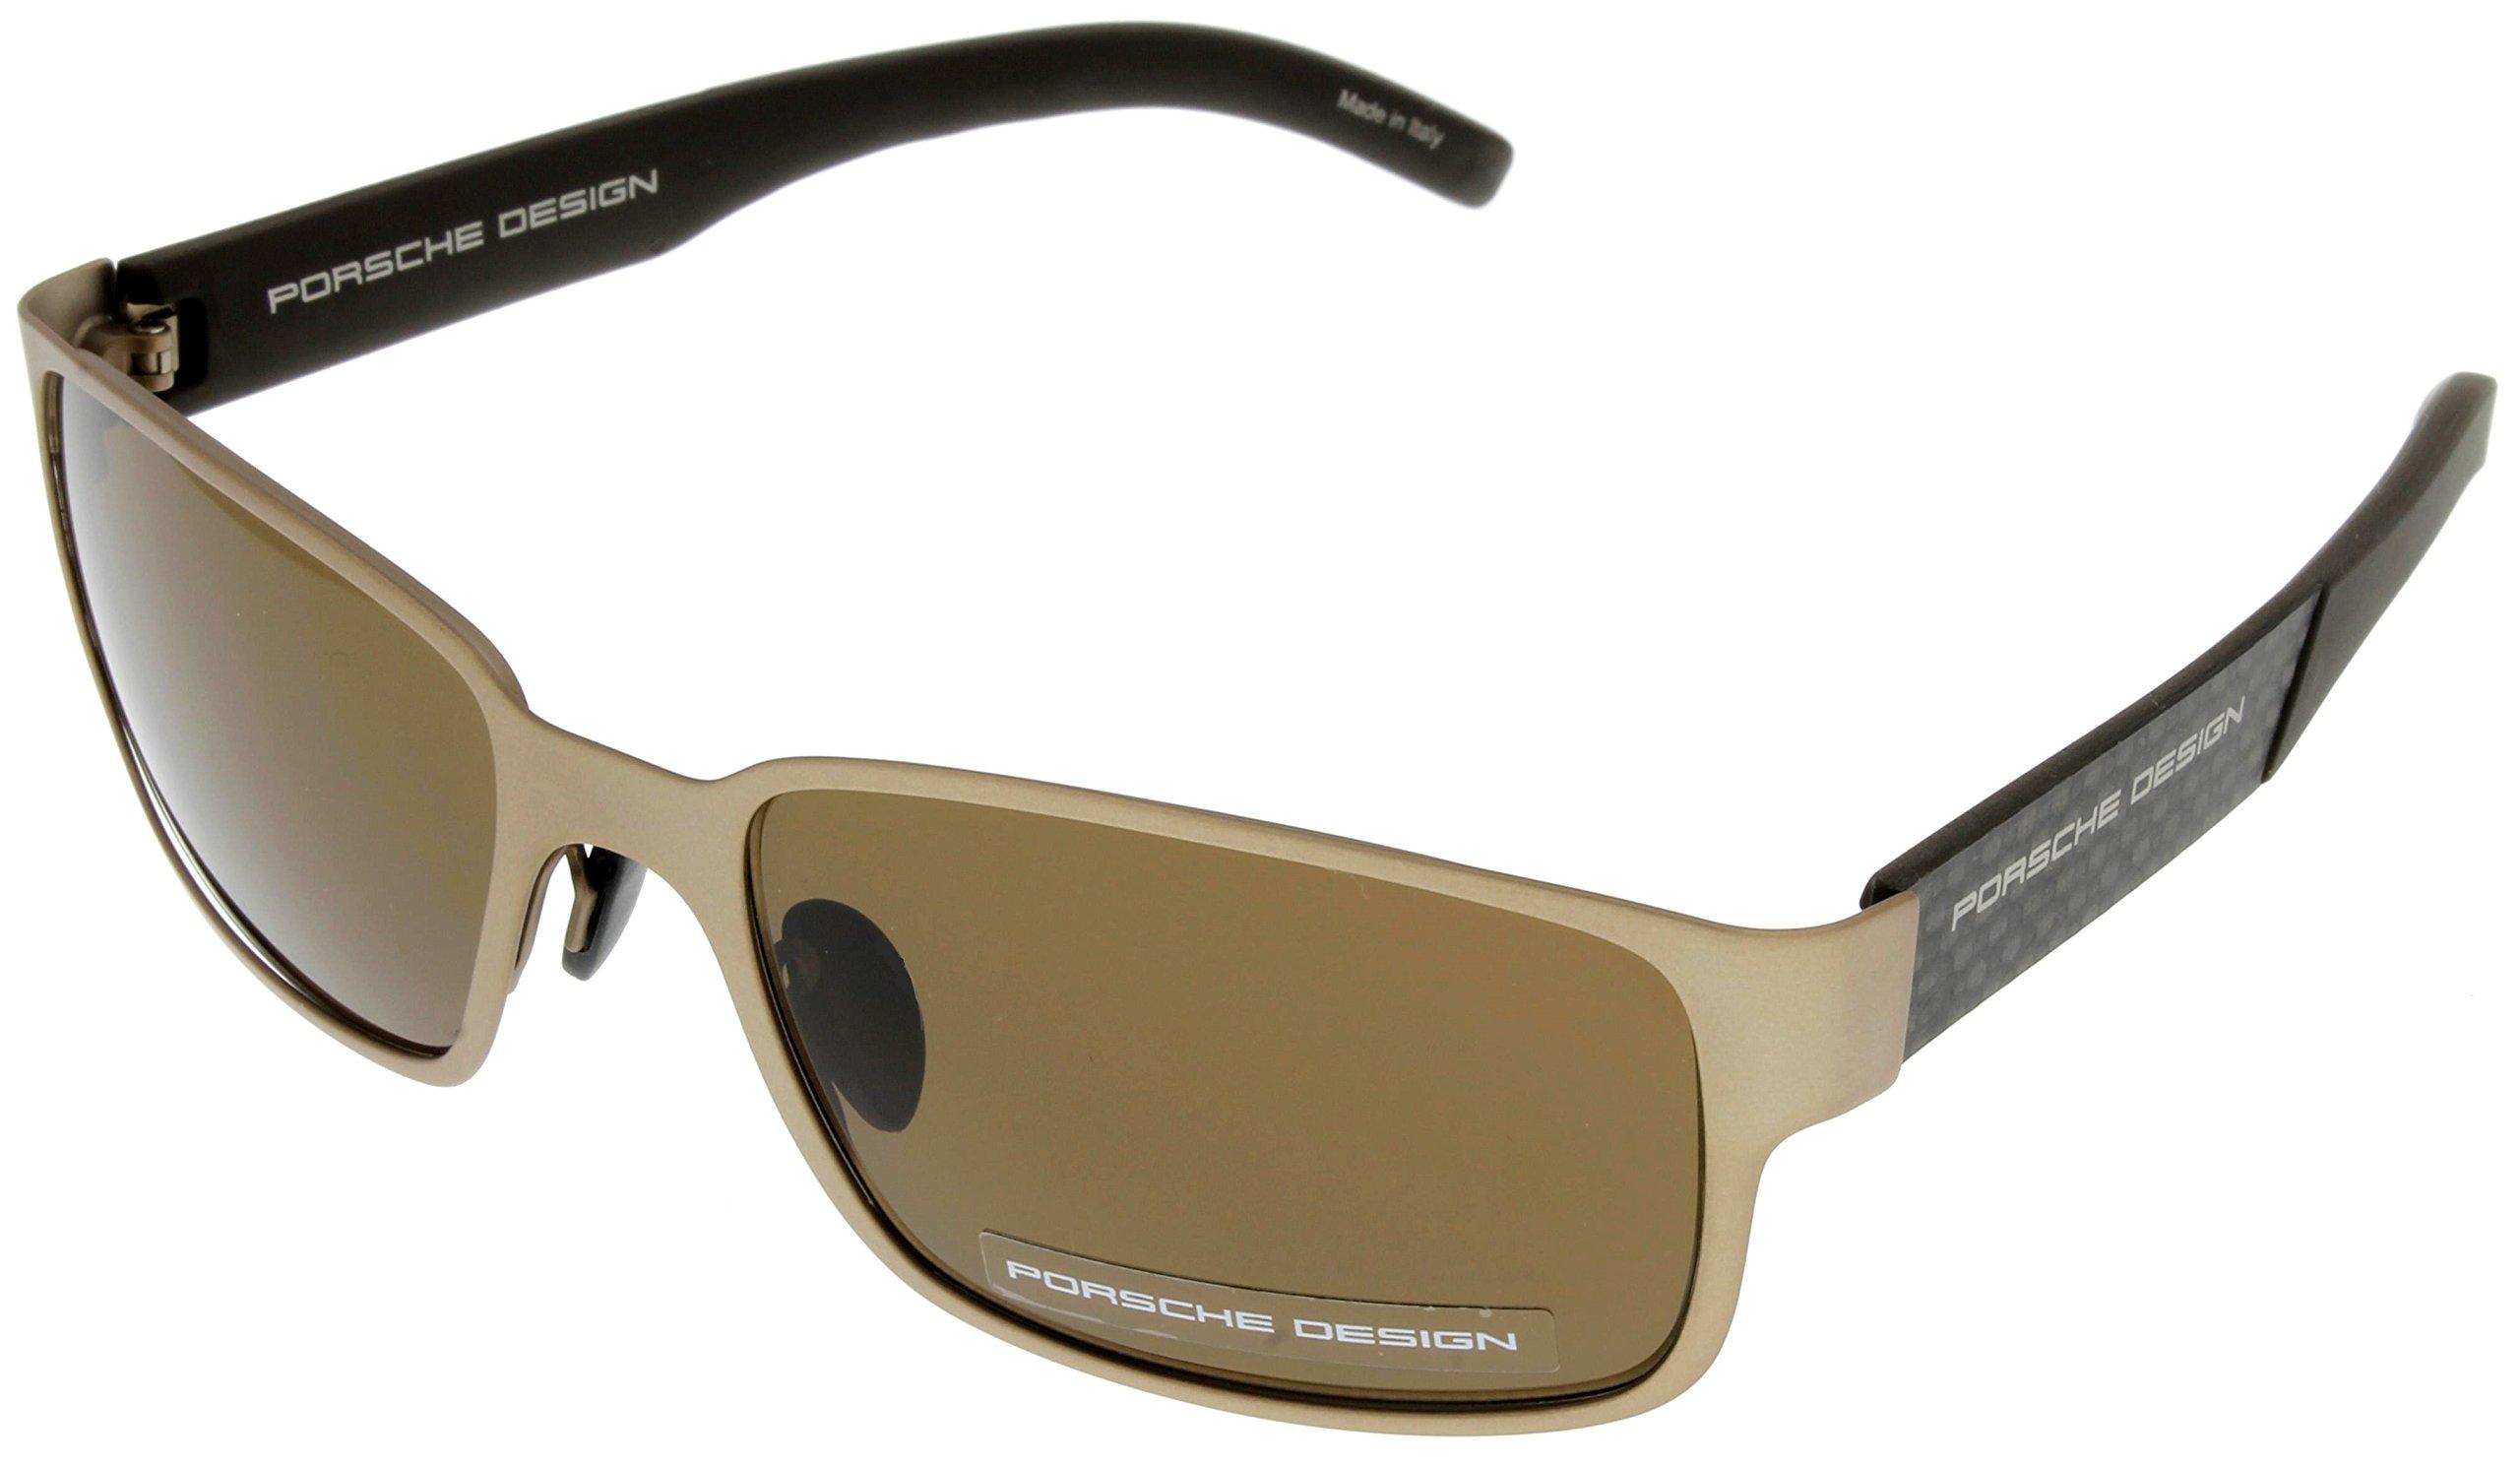 Porsche Design Sunglasses Bronze/Brown Unisex P8551 B Rectangular